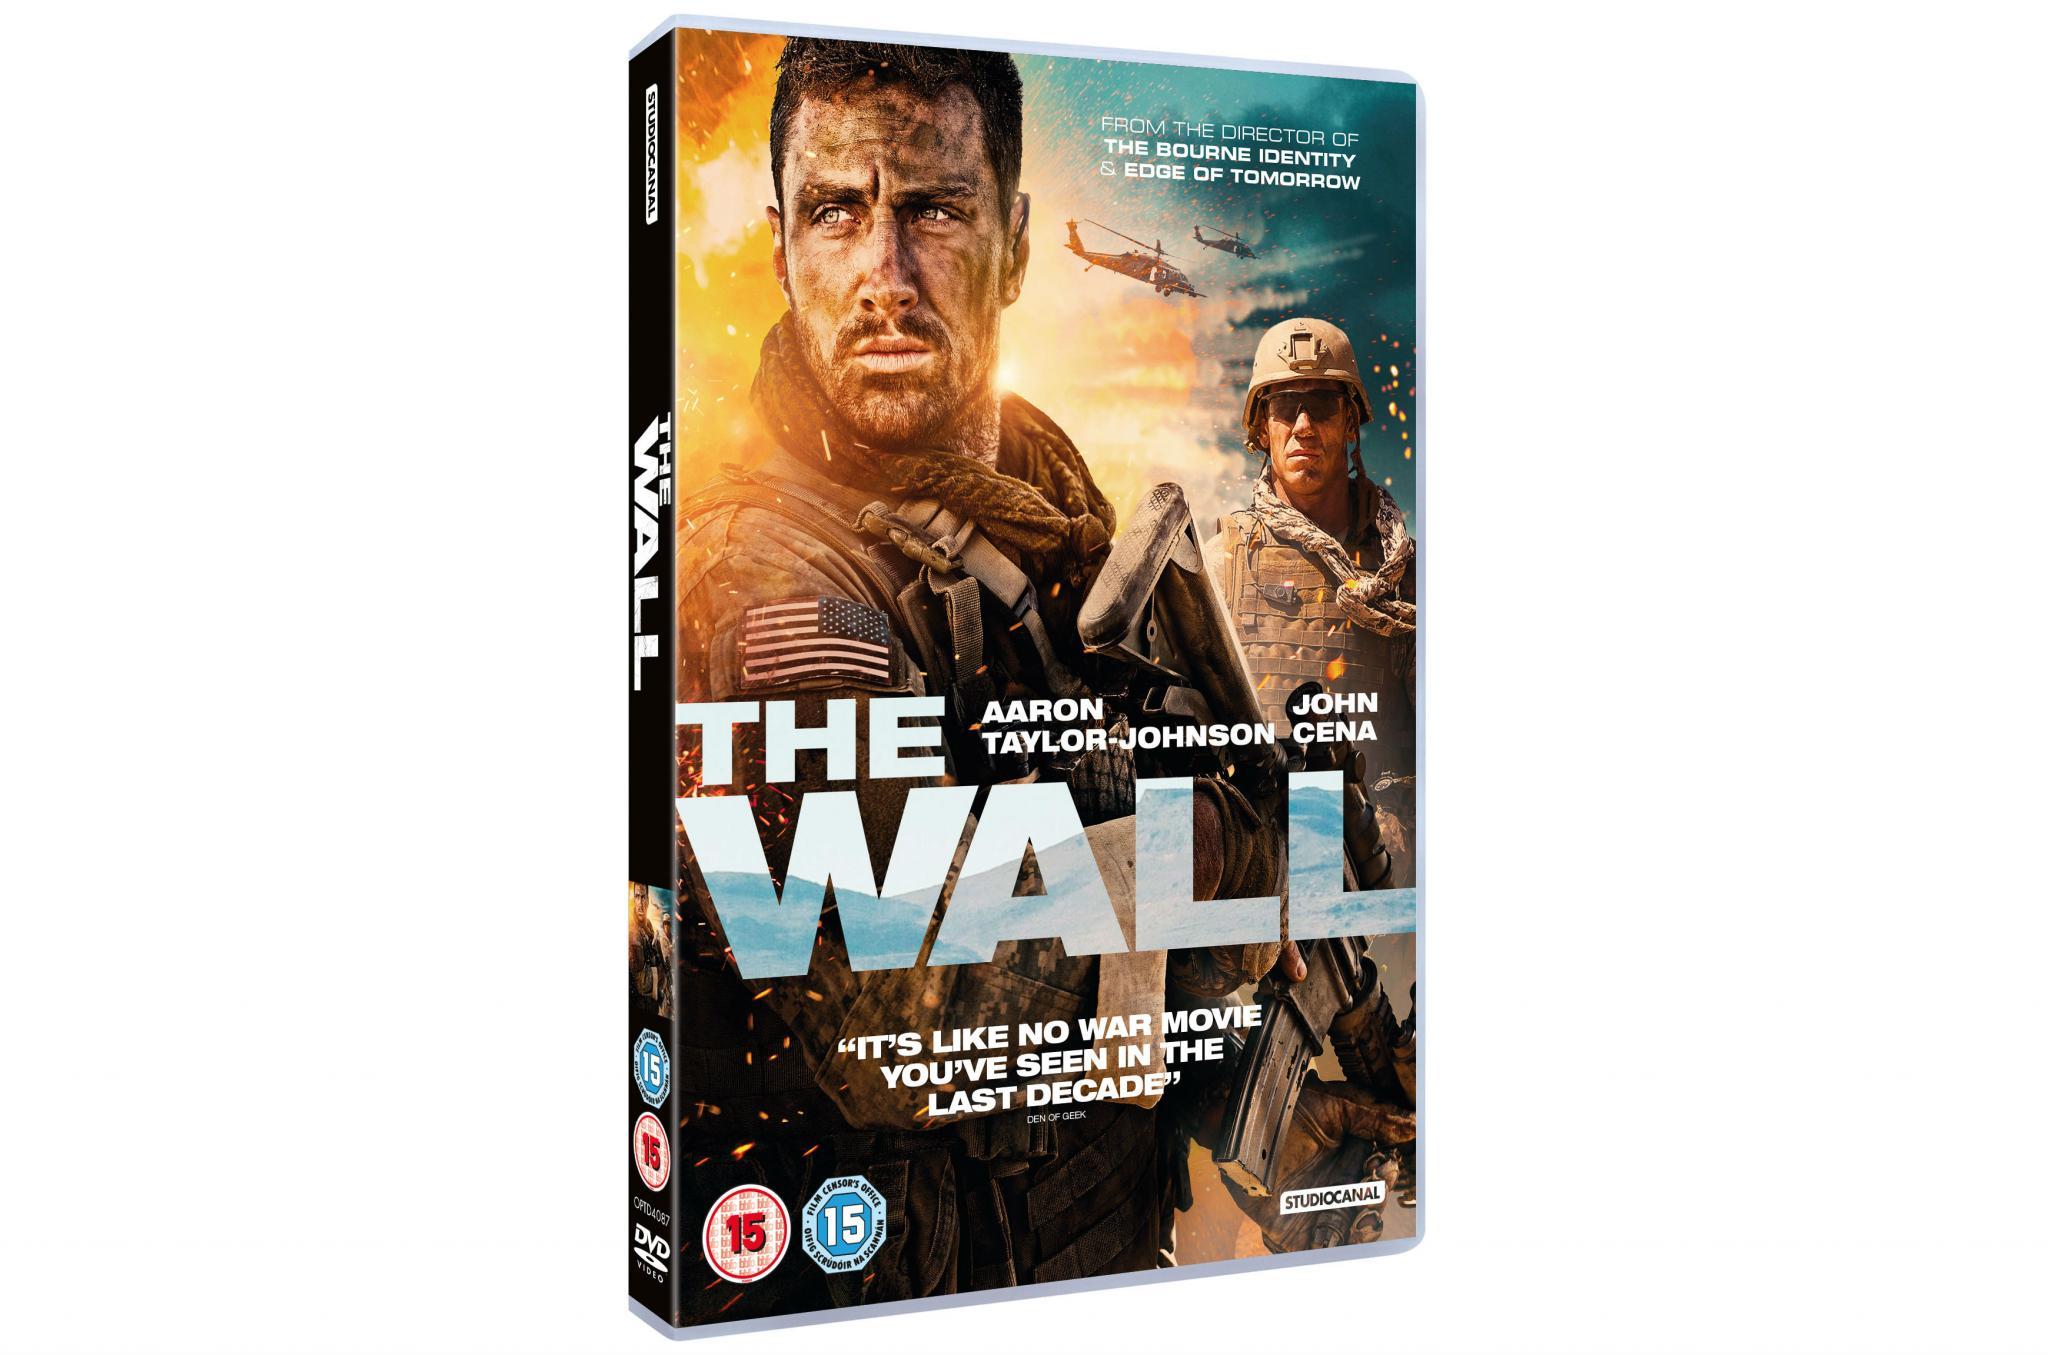 Win The Wall on DVD - HeyUGuys